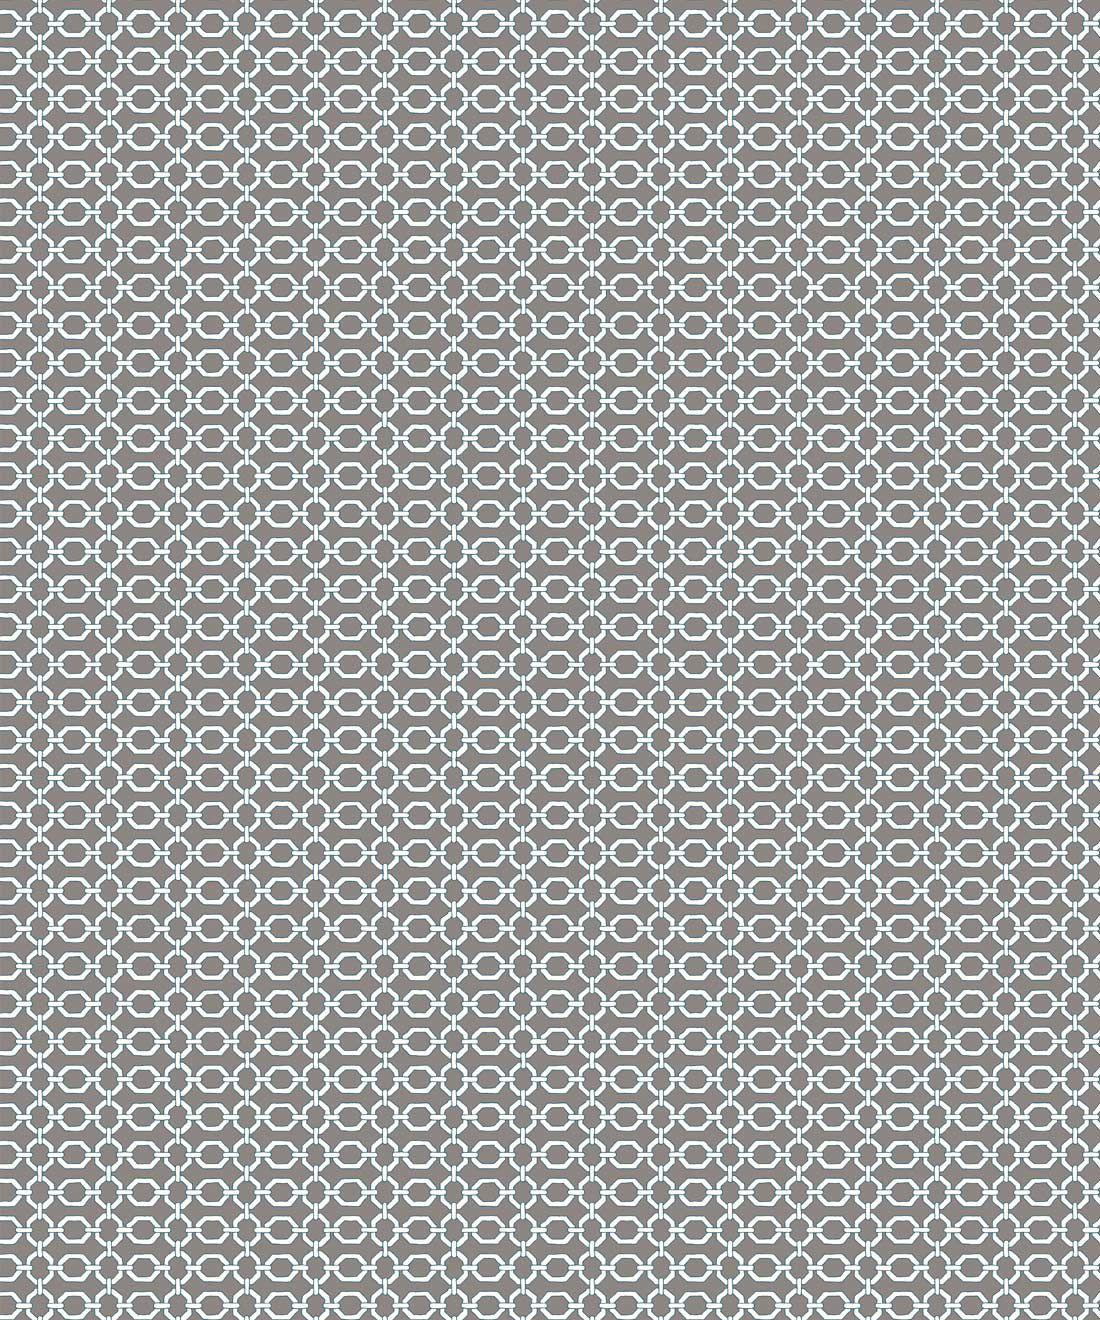 Ravello Wallpaper • Dianne Bergeron • Stone •Swatch